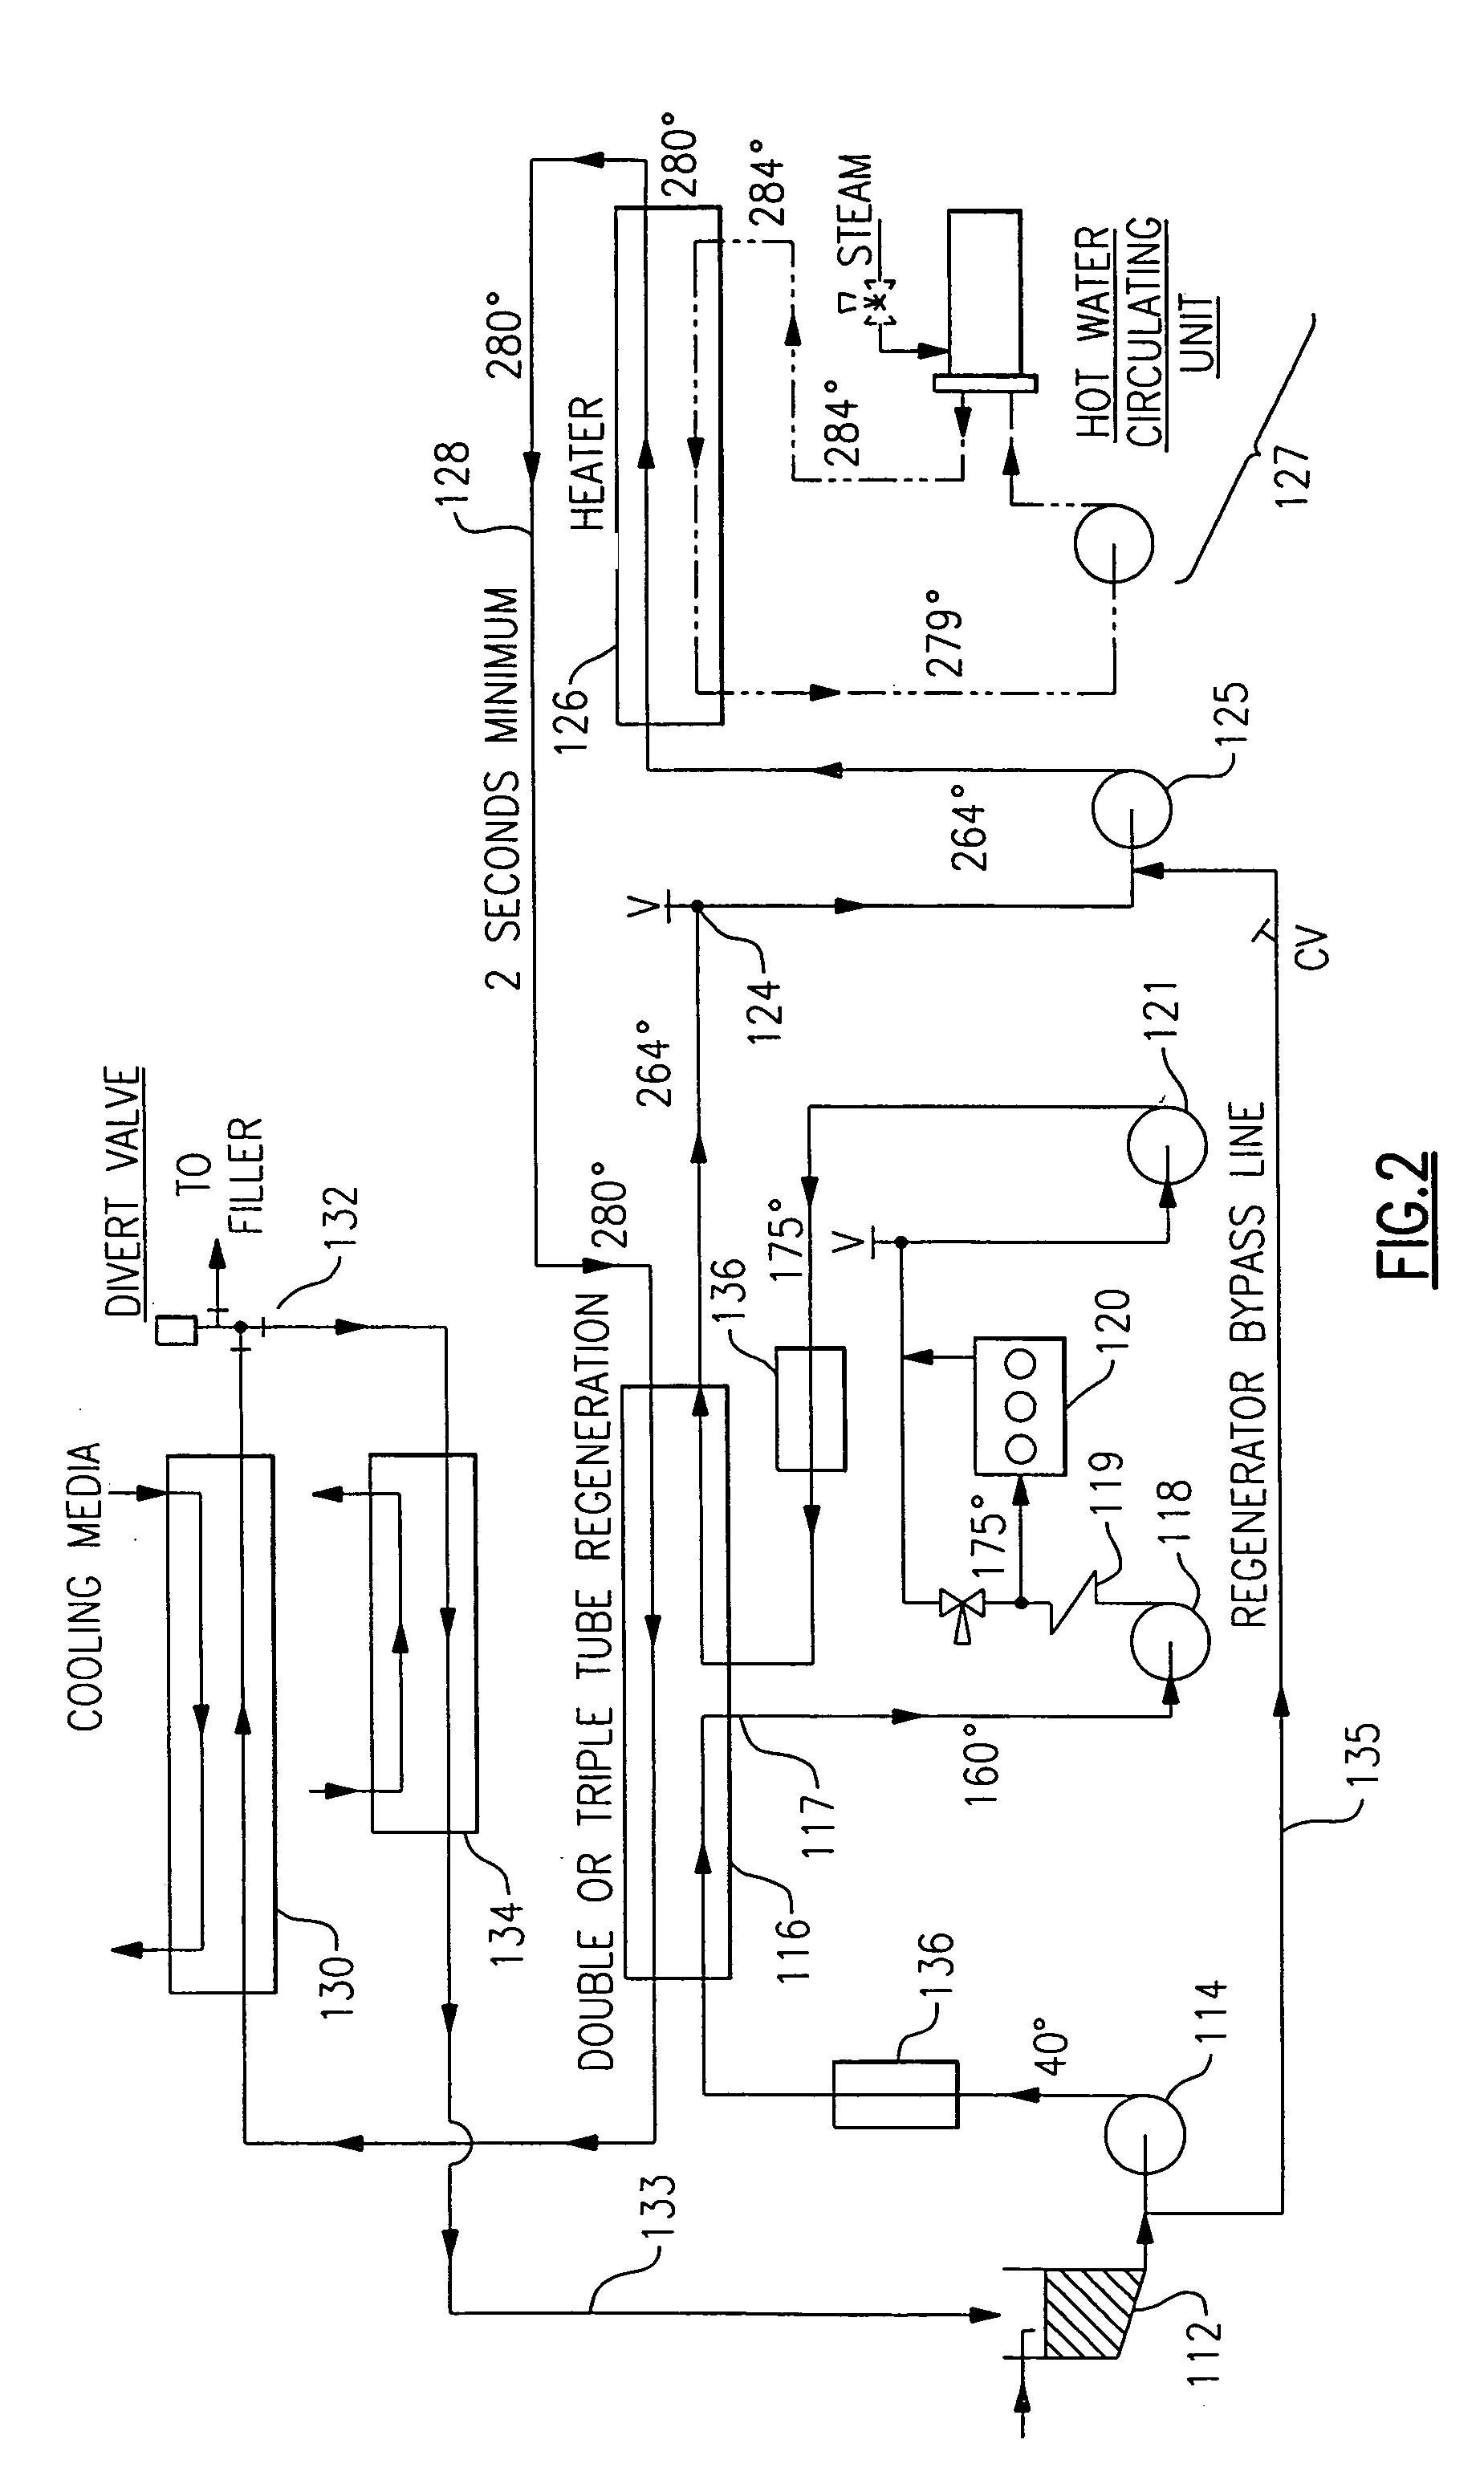 patent us7186430 - uht pasteurizer with regeneration